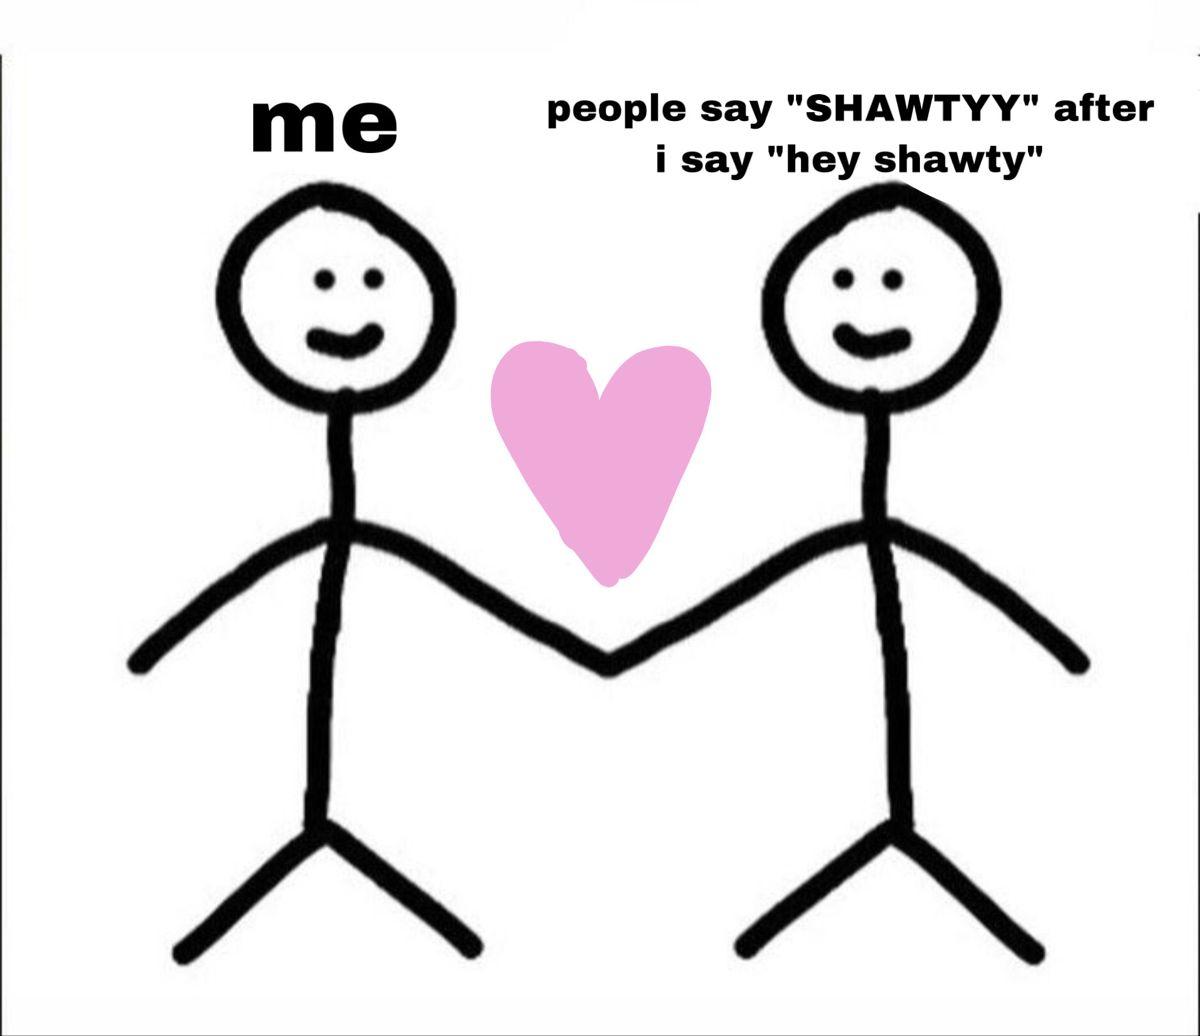 i love u guys so much gimmie kiss mwah